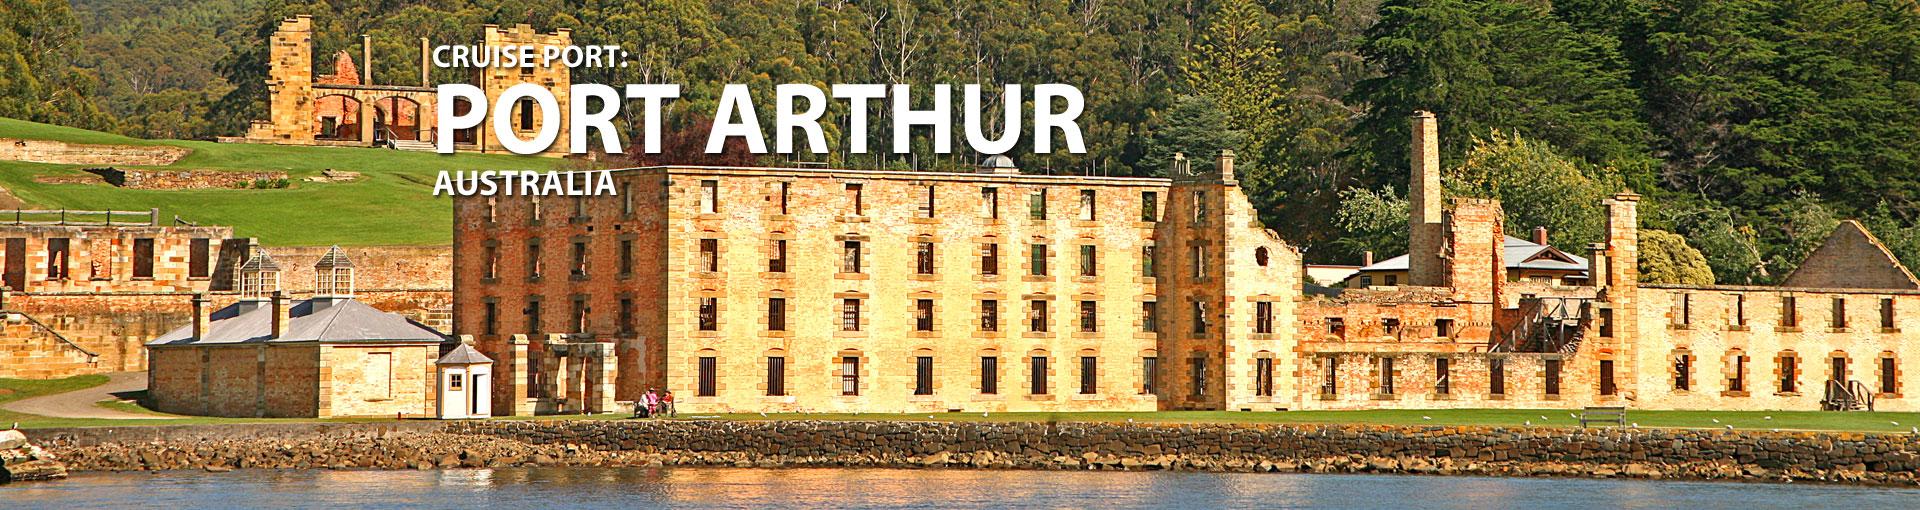 Cruises to Port Arthur, Australia